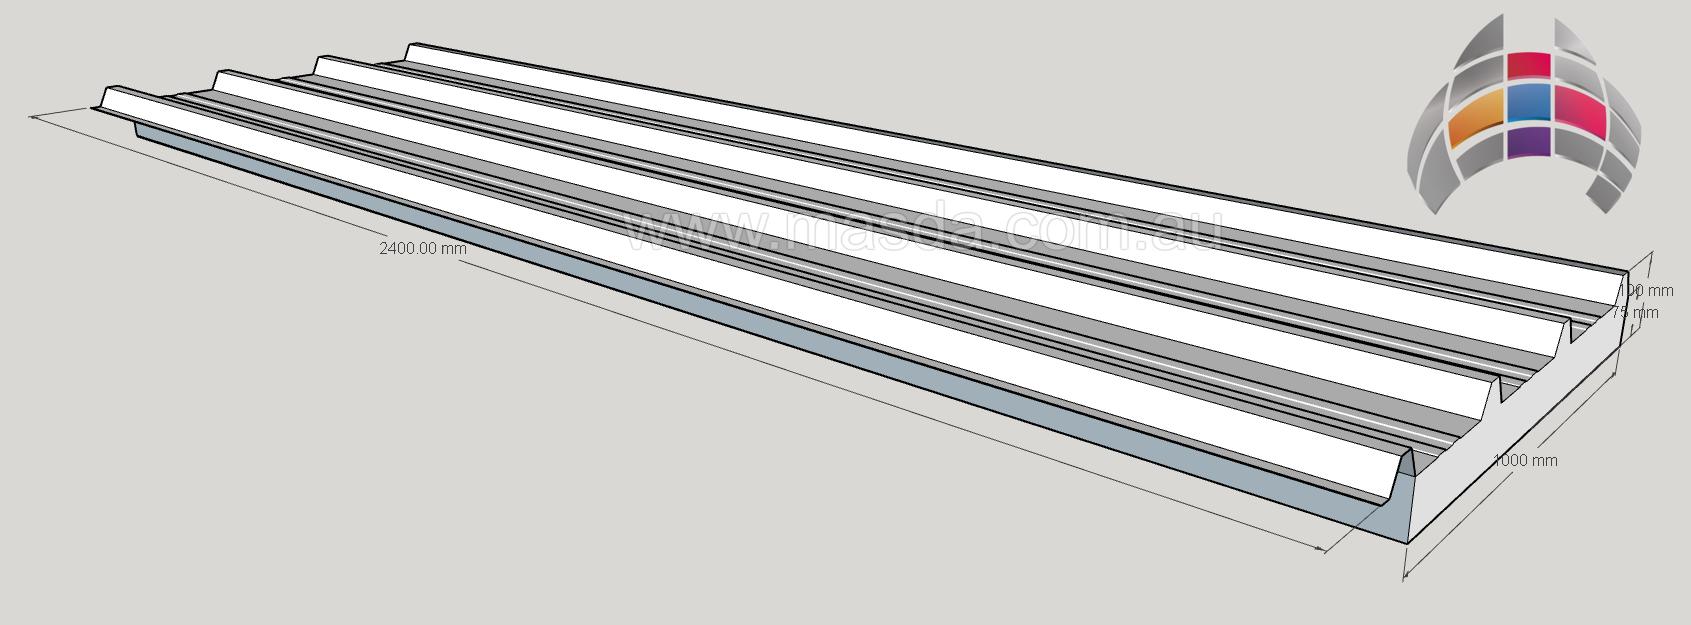 Masda Roof Panel 75mm2